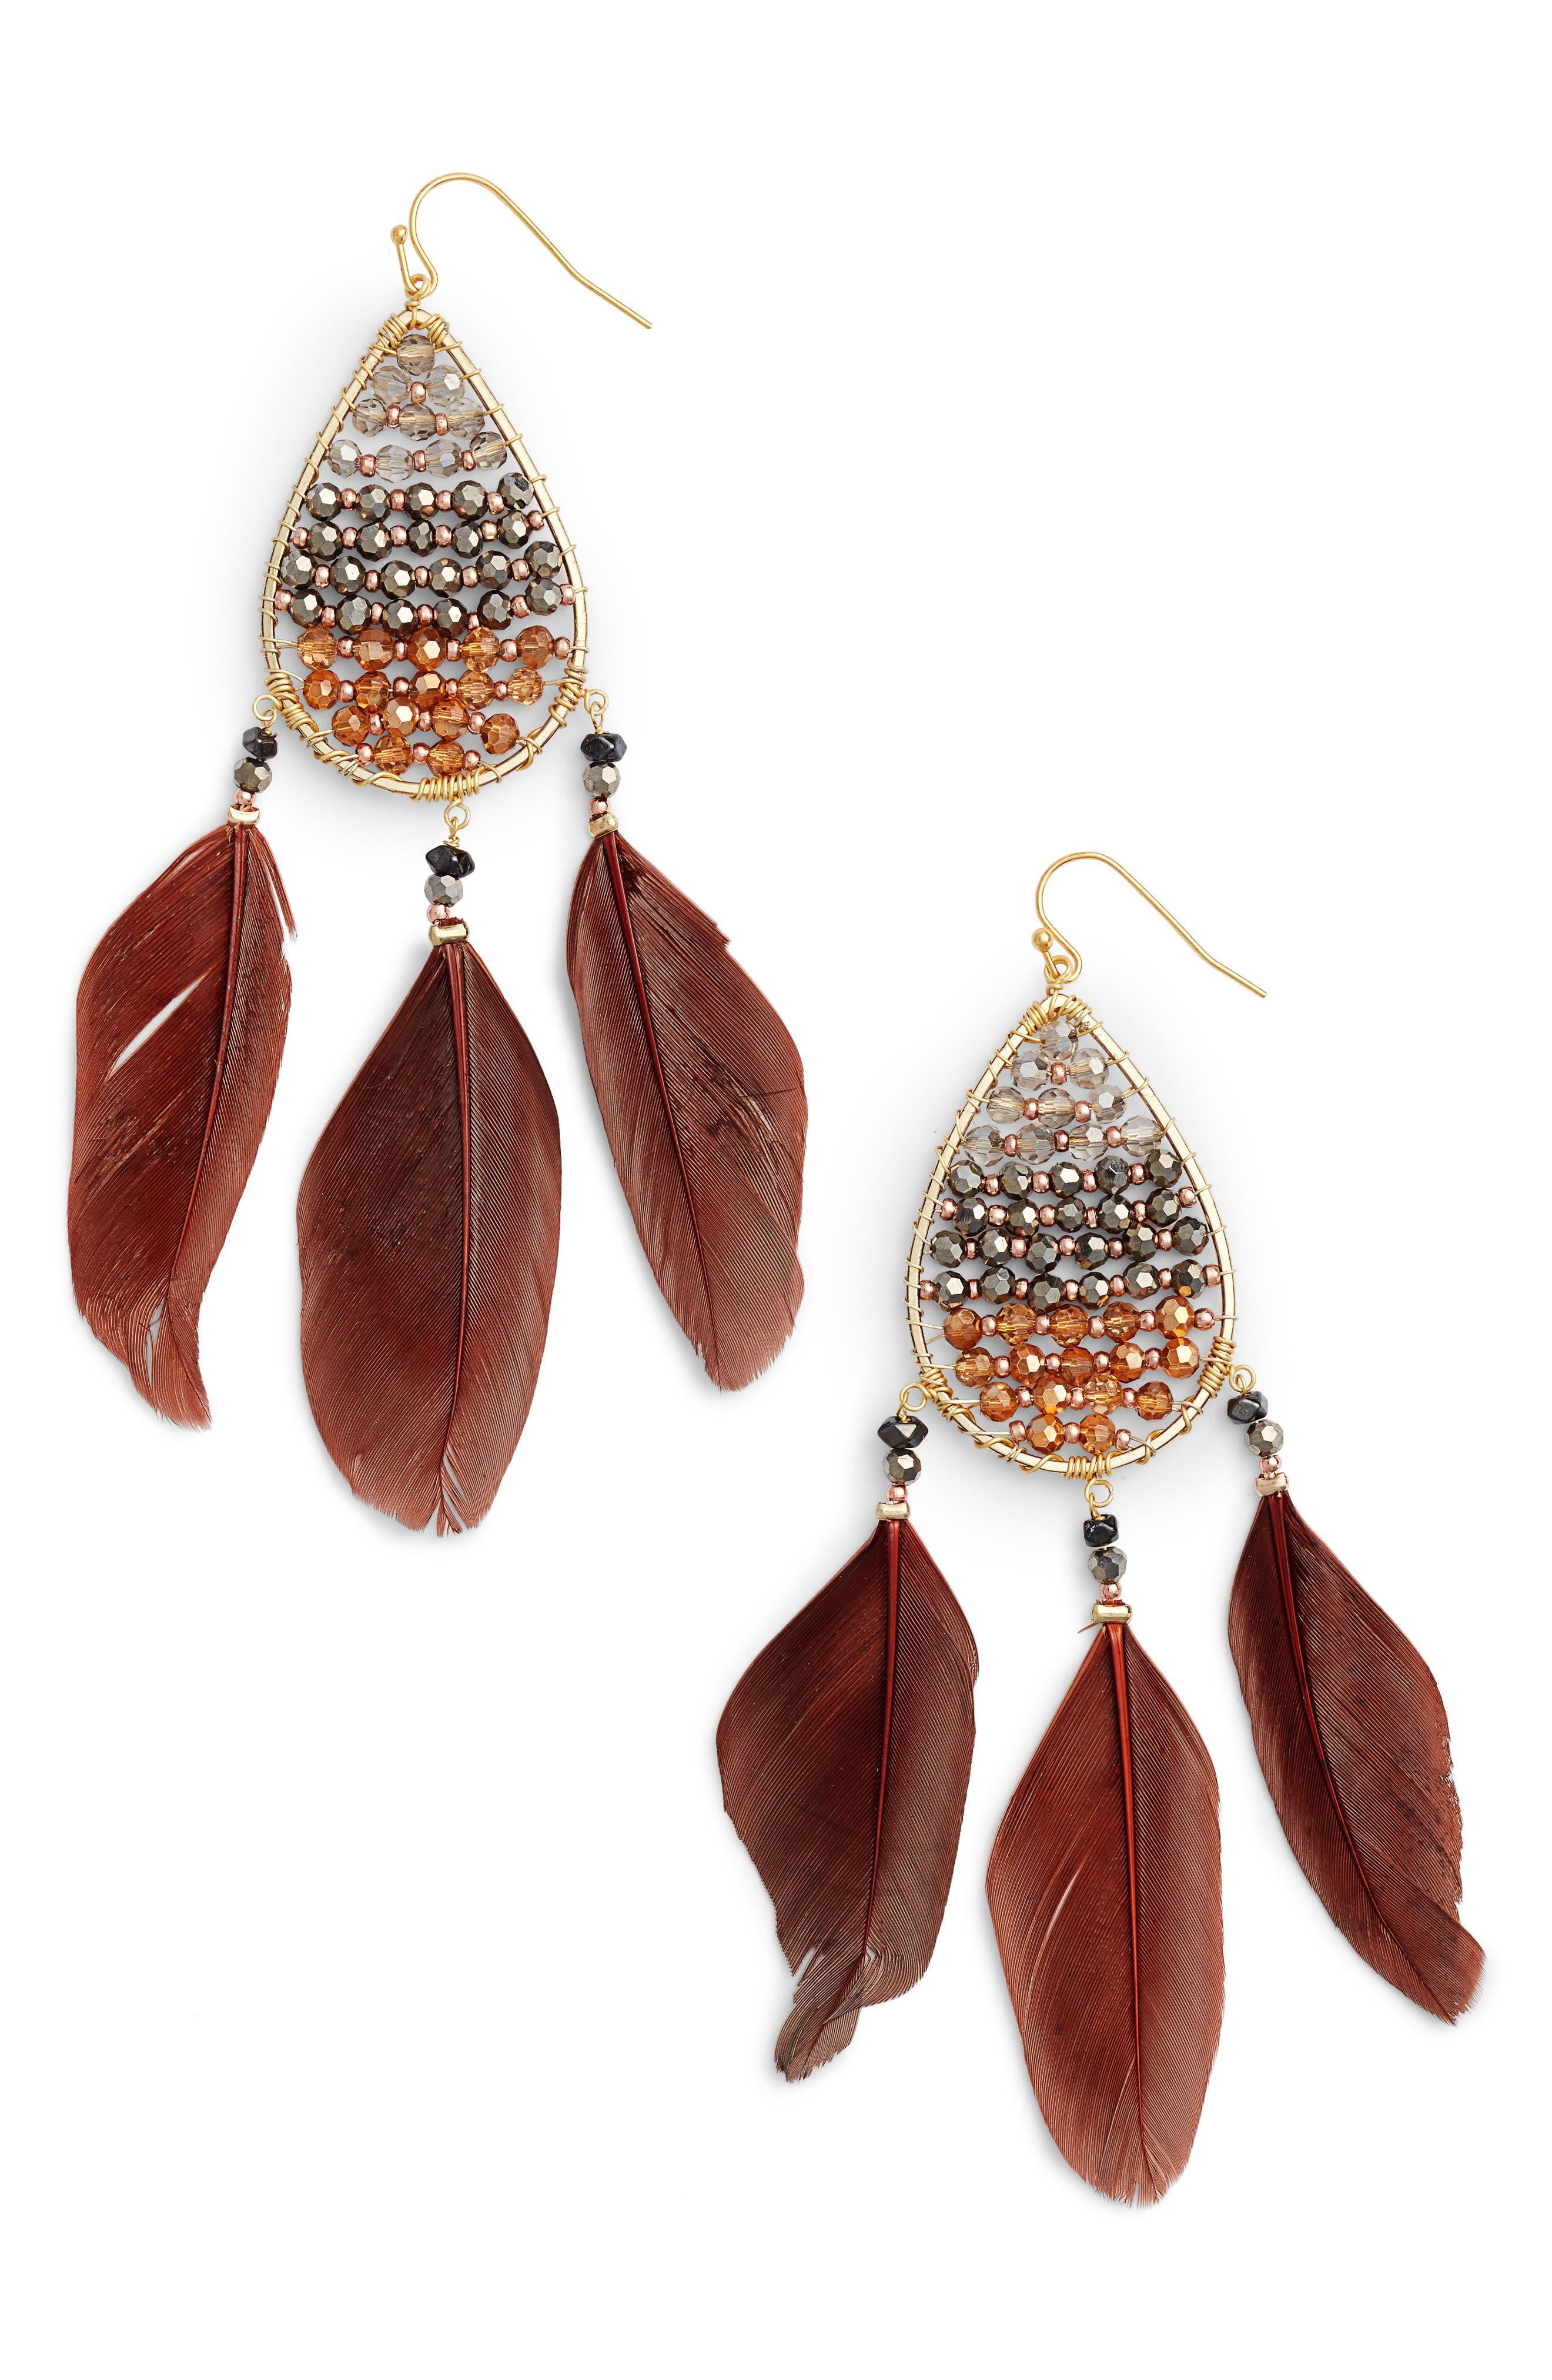 Main Image - Nakamol Design Teardrop Feather Earrings